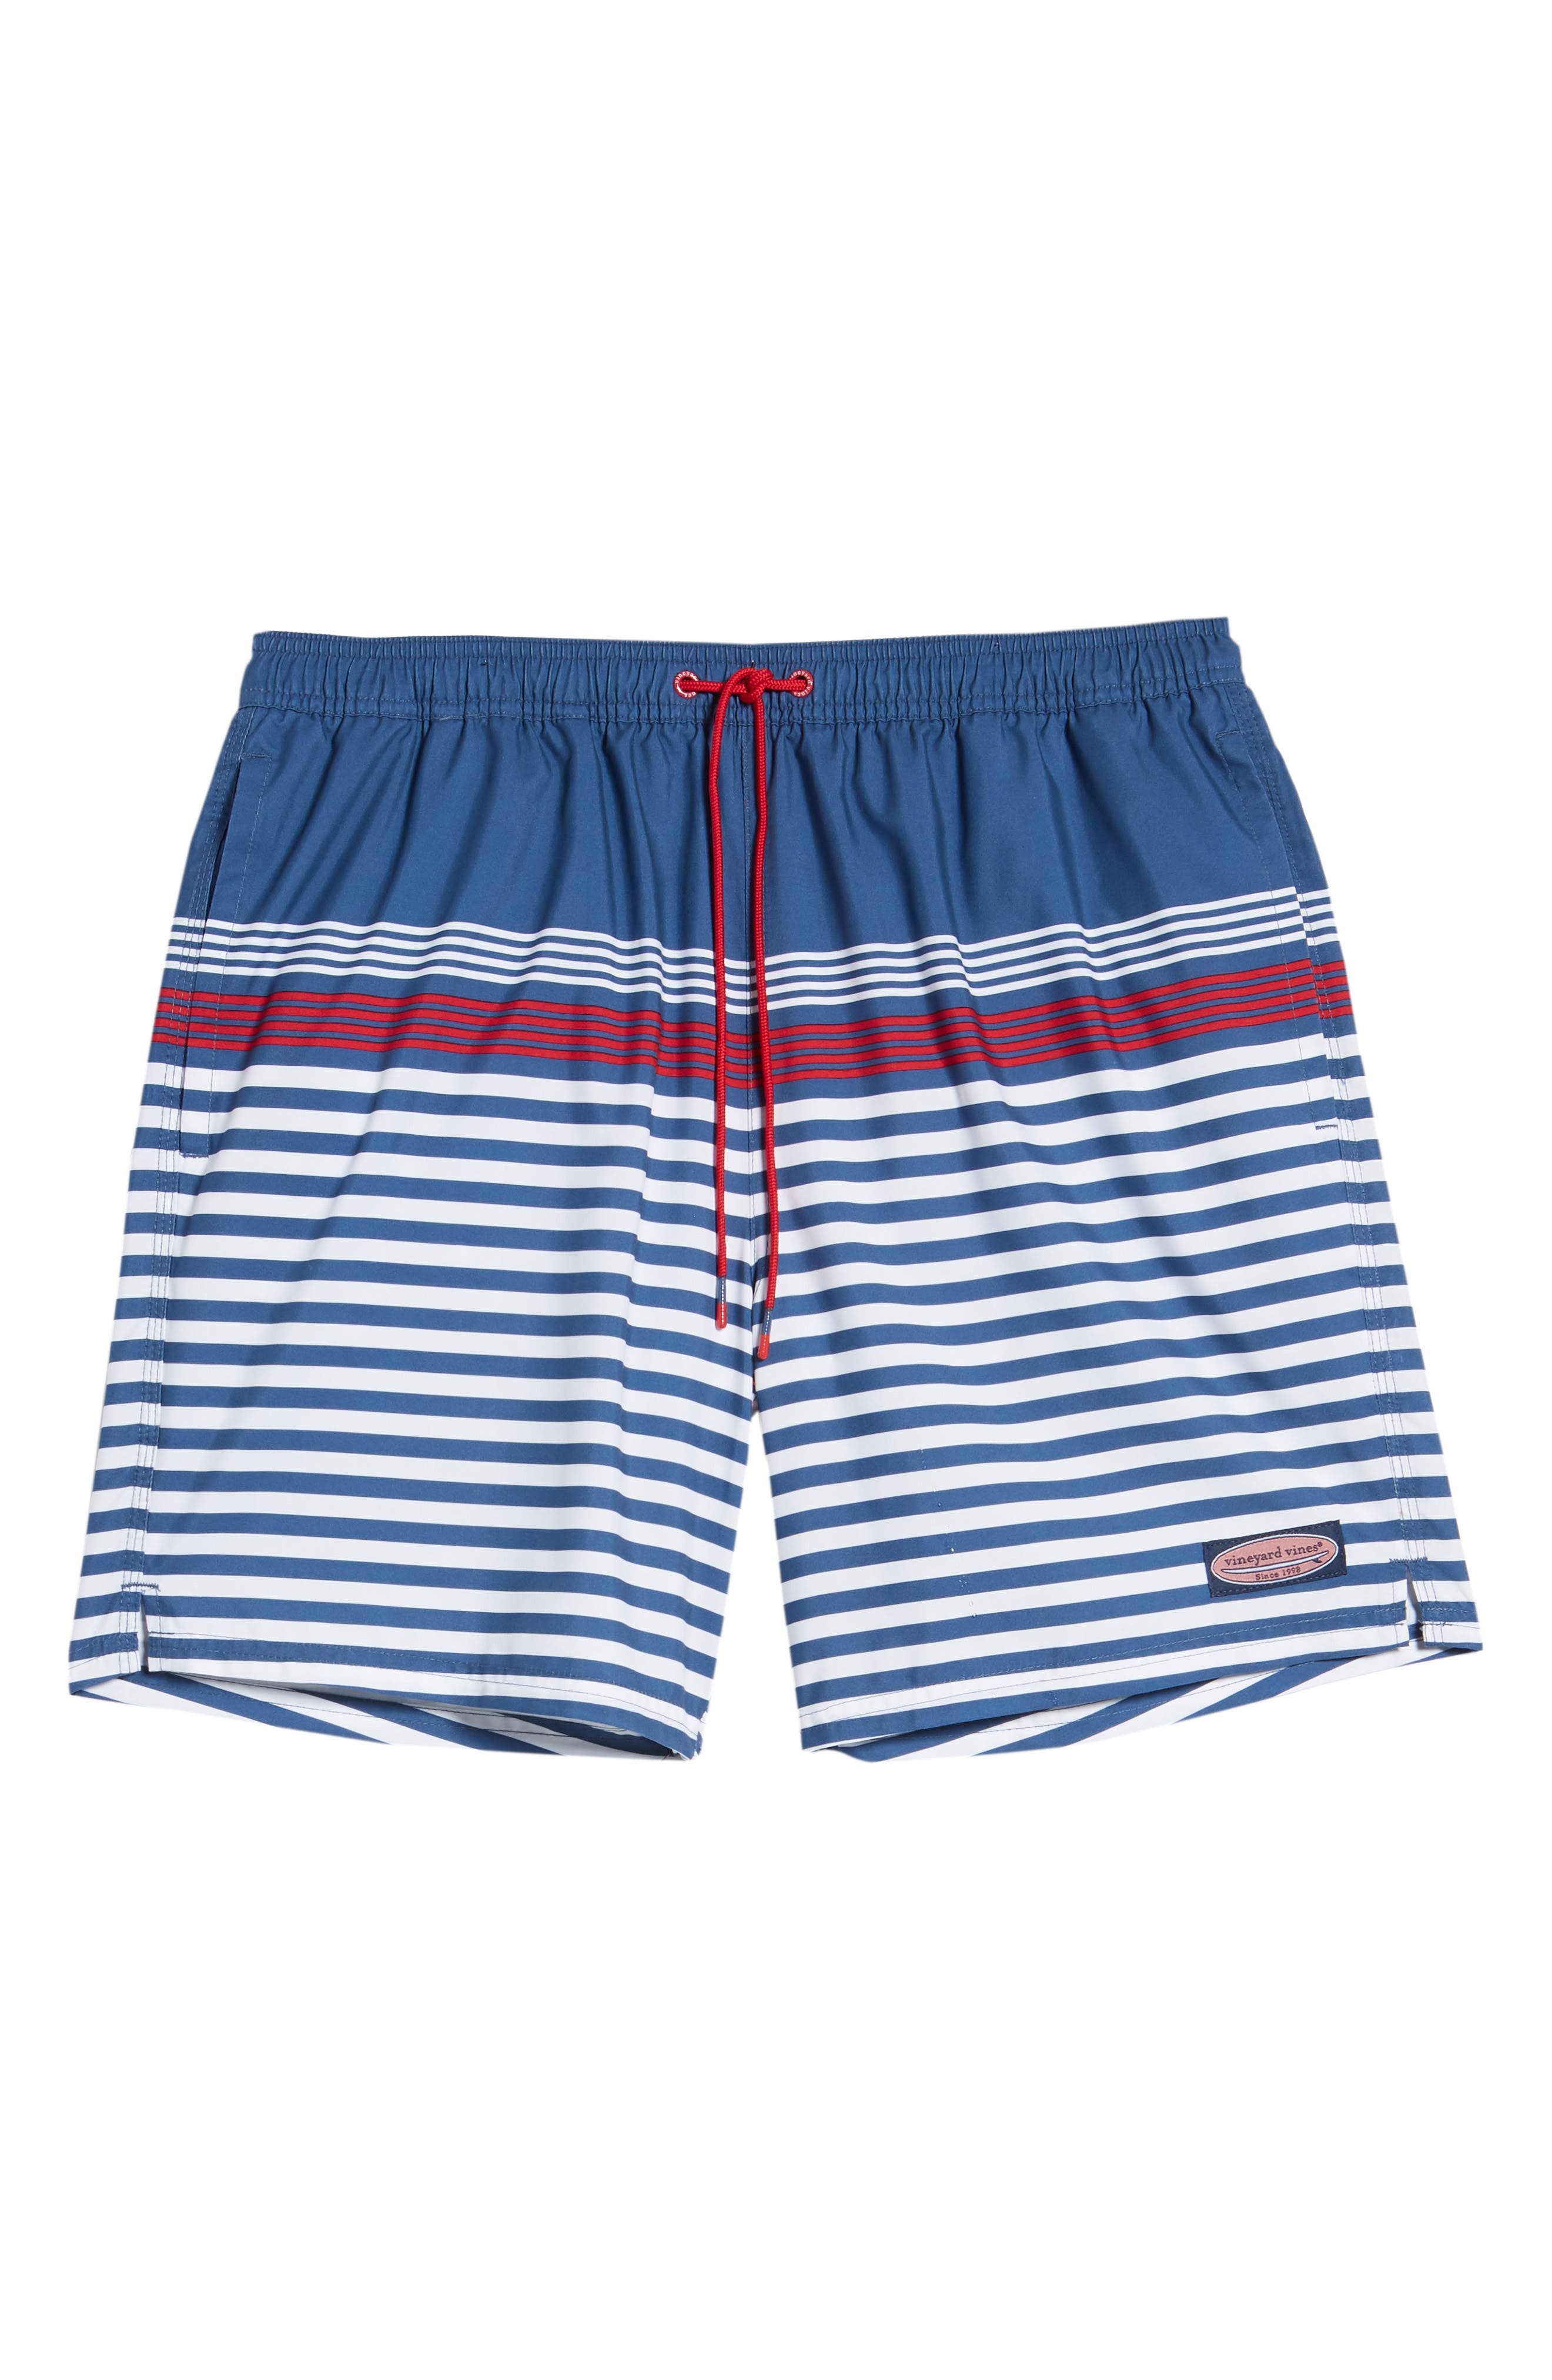 Chappy Summerall Stripe Swim Trunks,                             Alternate thumbnail 6, color,                             461